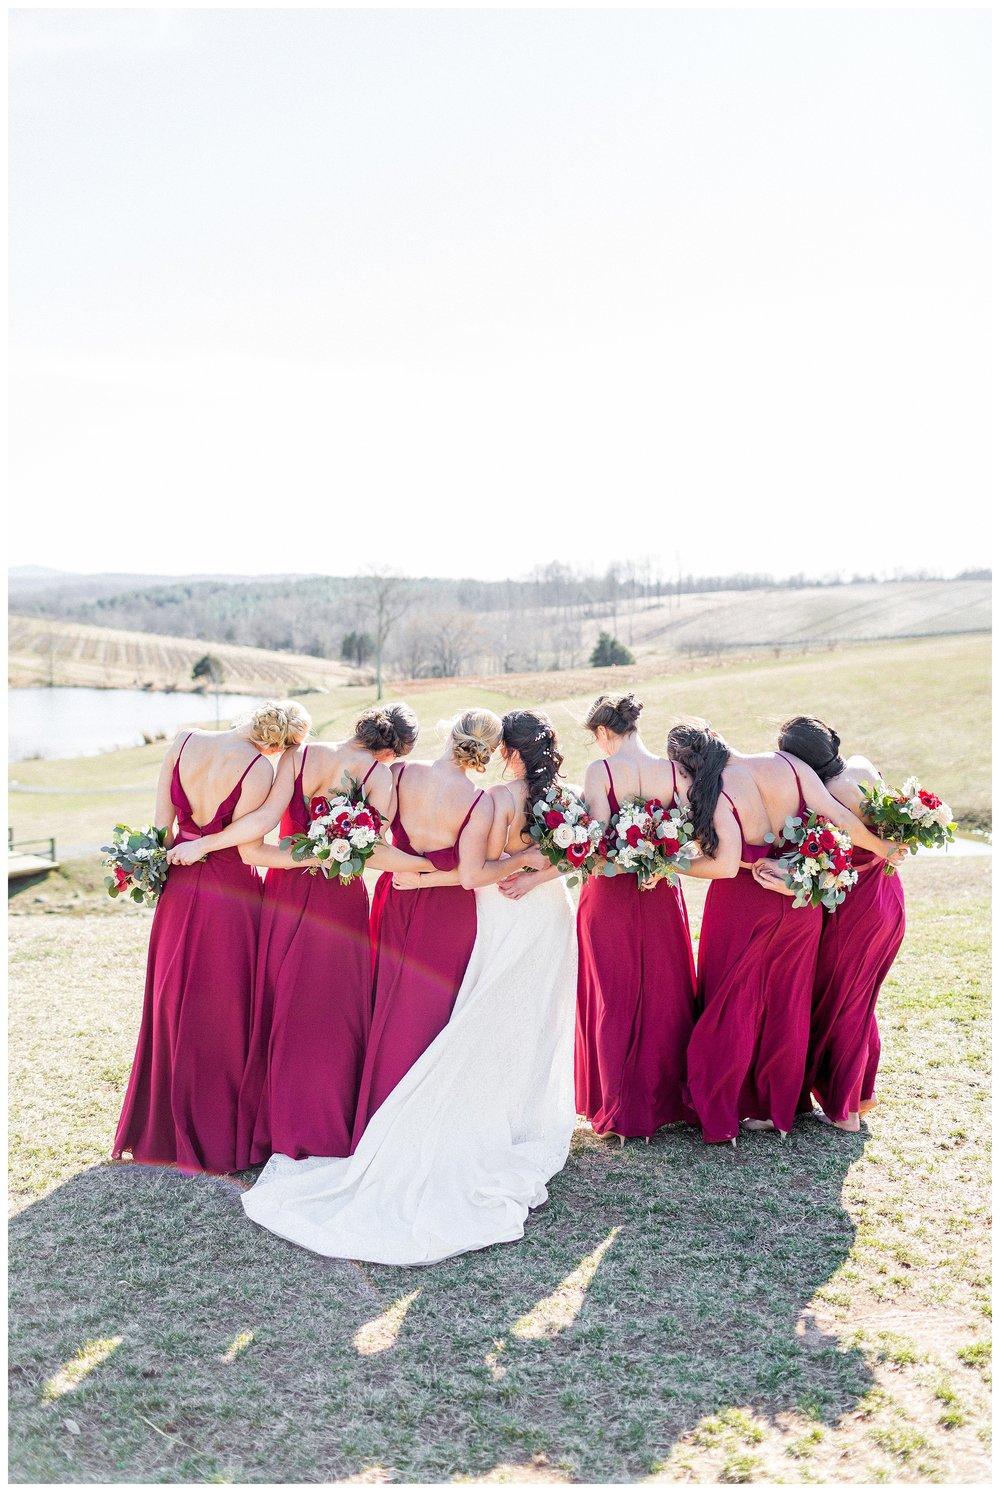 Stone Tower Winery Wedding | Virginia Winter Wedding | VA Wedding Photographer Kir Tuben_0070.jpg